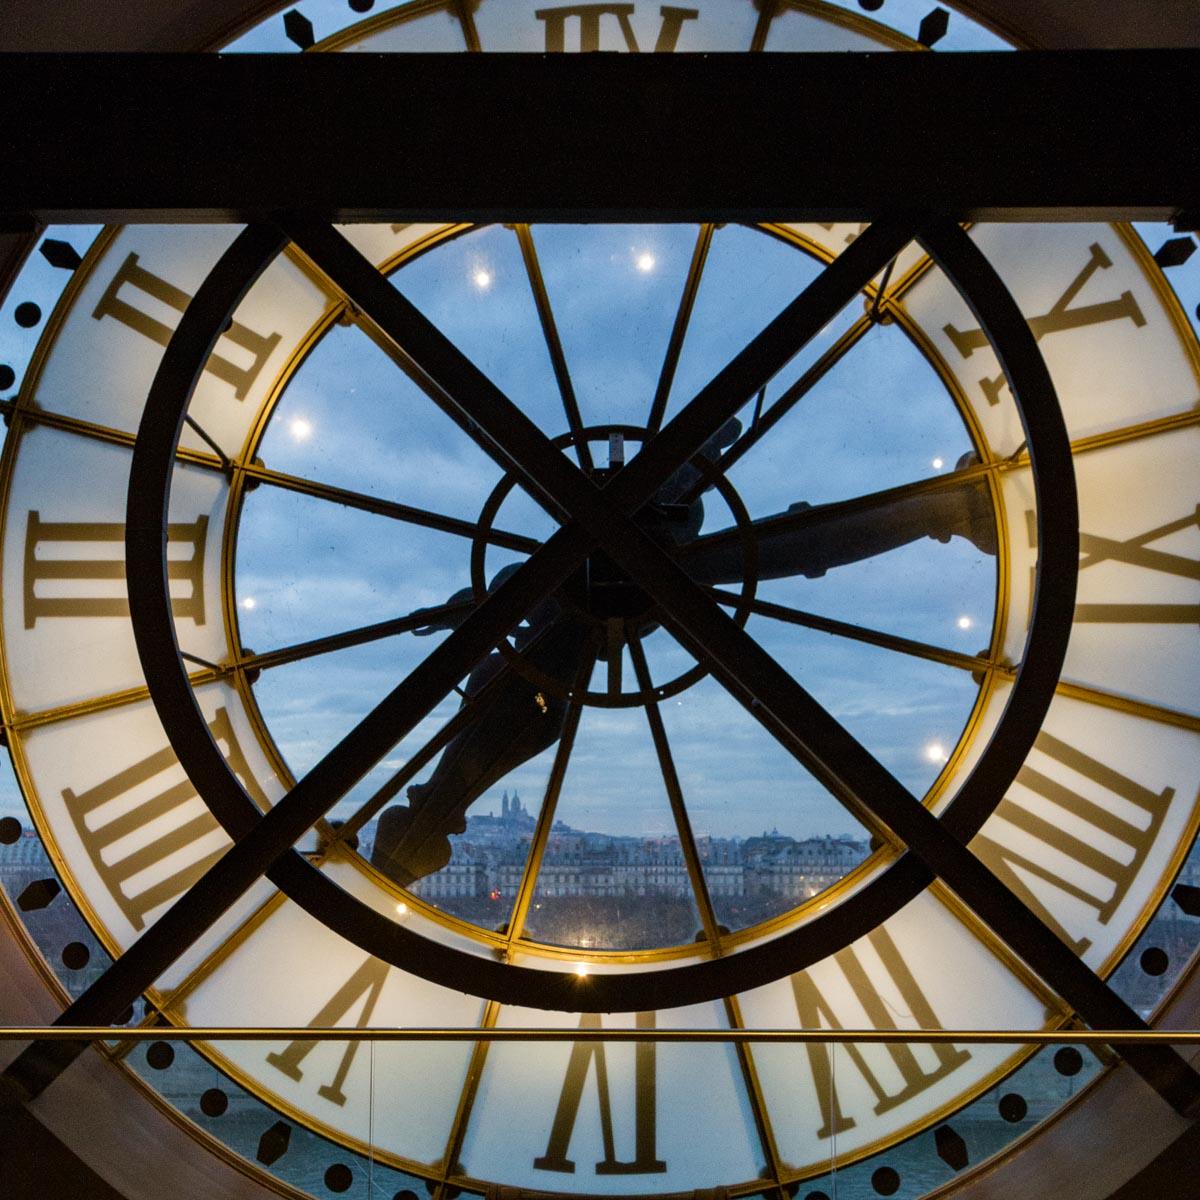 Clock, Musee d'Orsay, Pariis, France